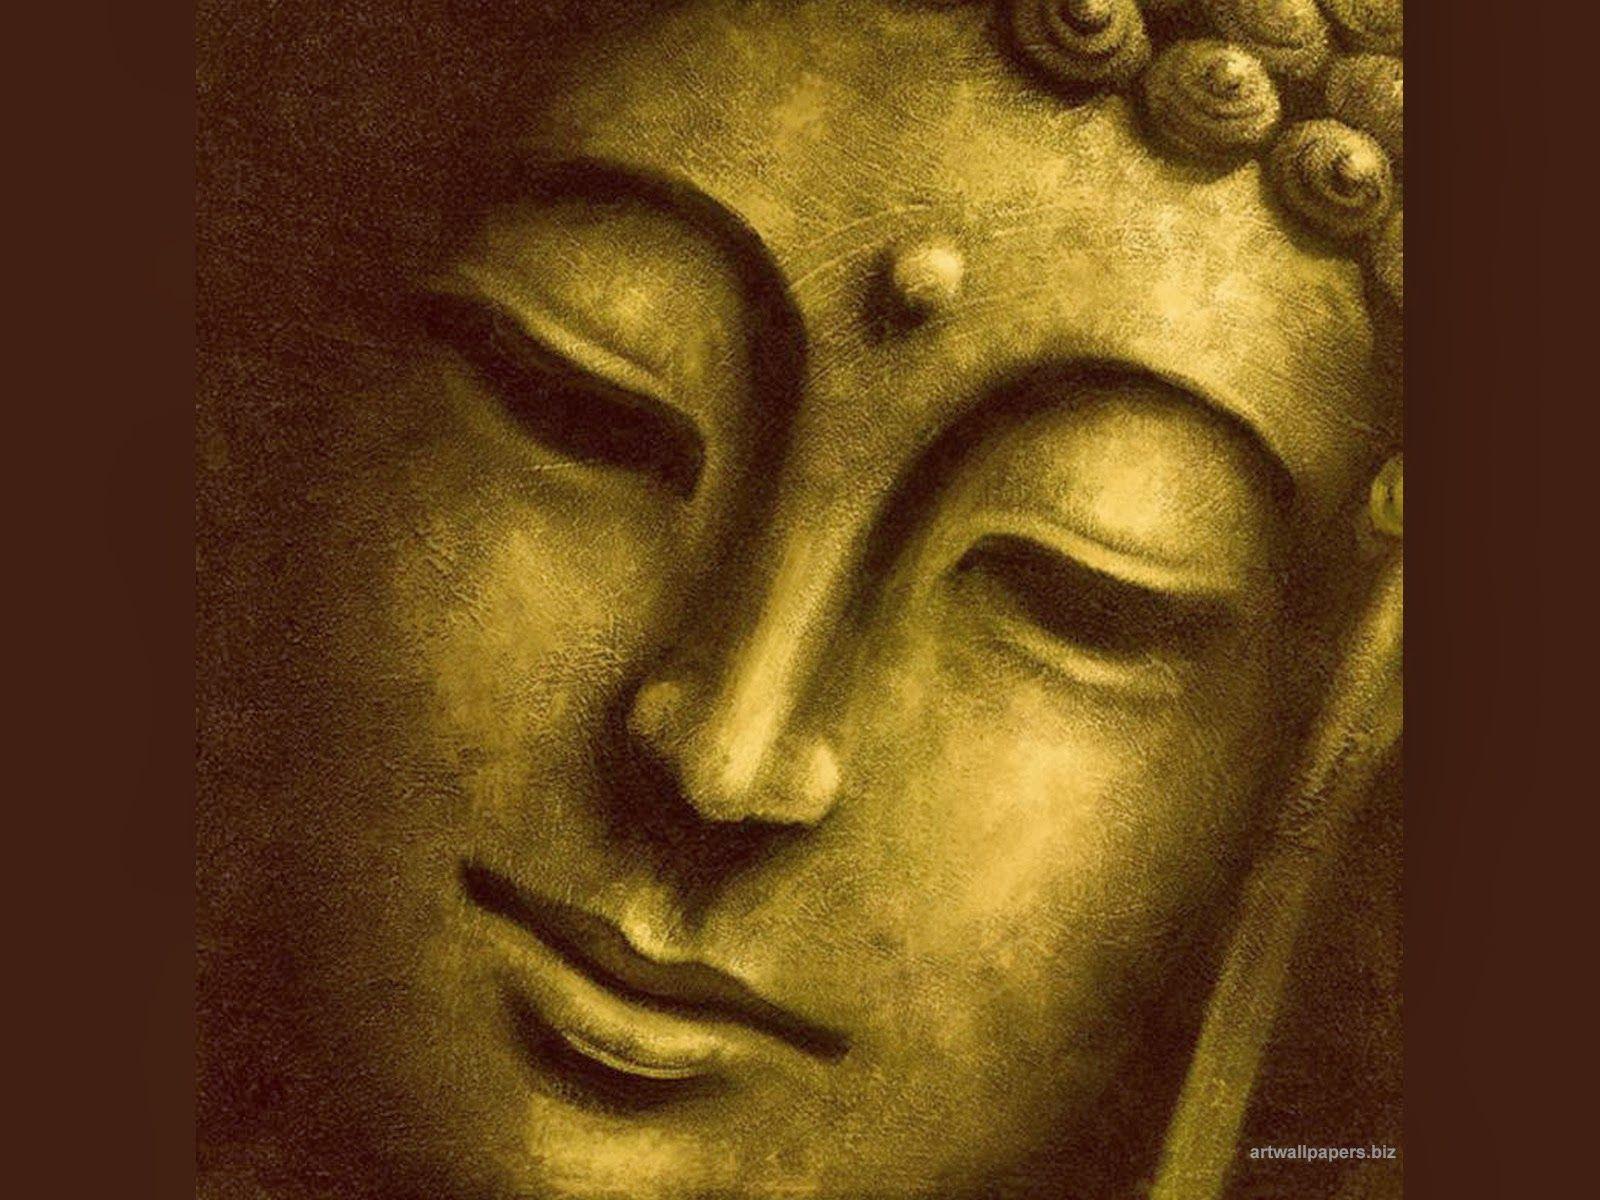 HiNDU GOD Lord Buddha